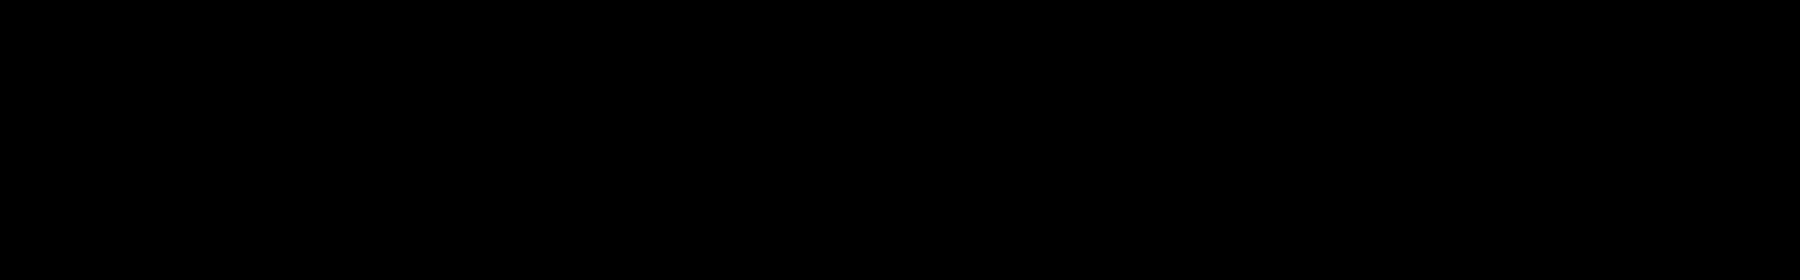 Marshmellow Future Bass audio waveform